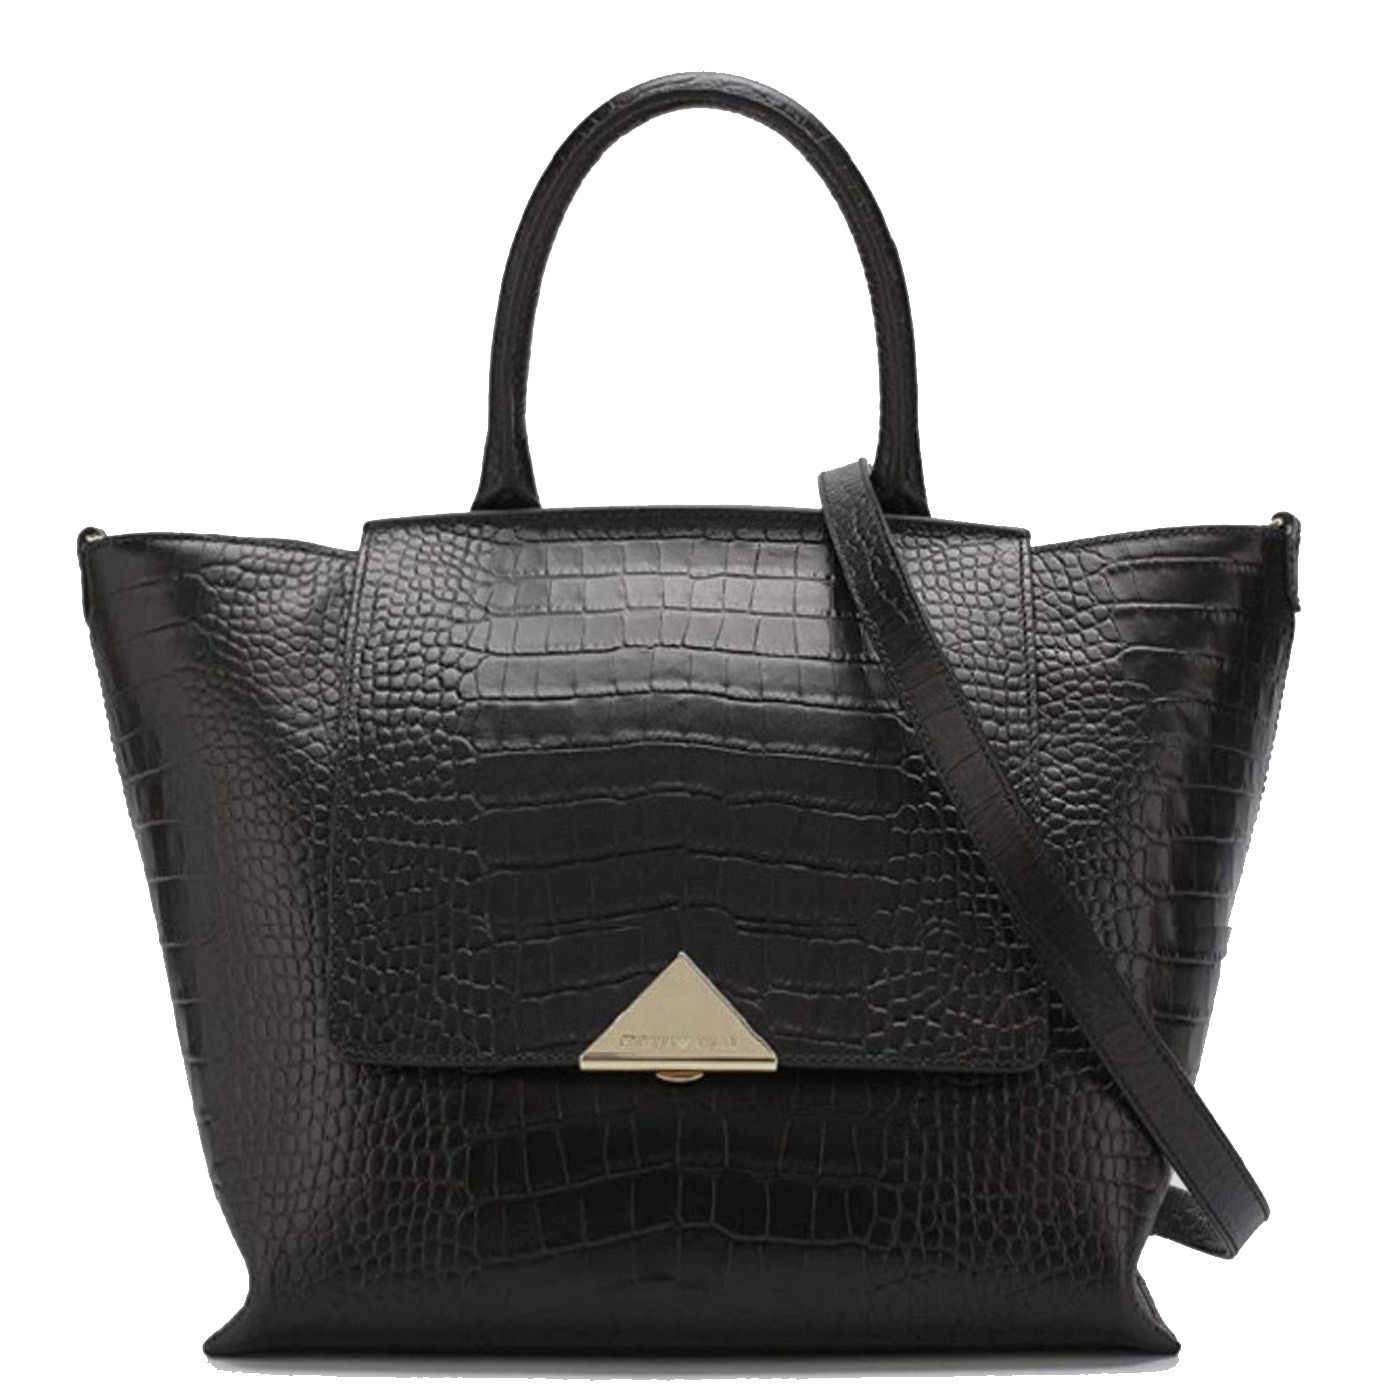 9da481985b77 Details about EMPORIO ARMANI Leather Hand Bag